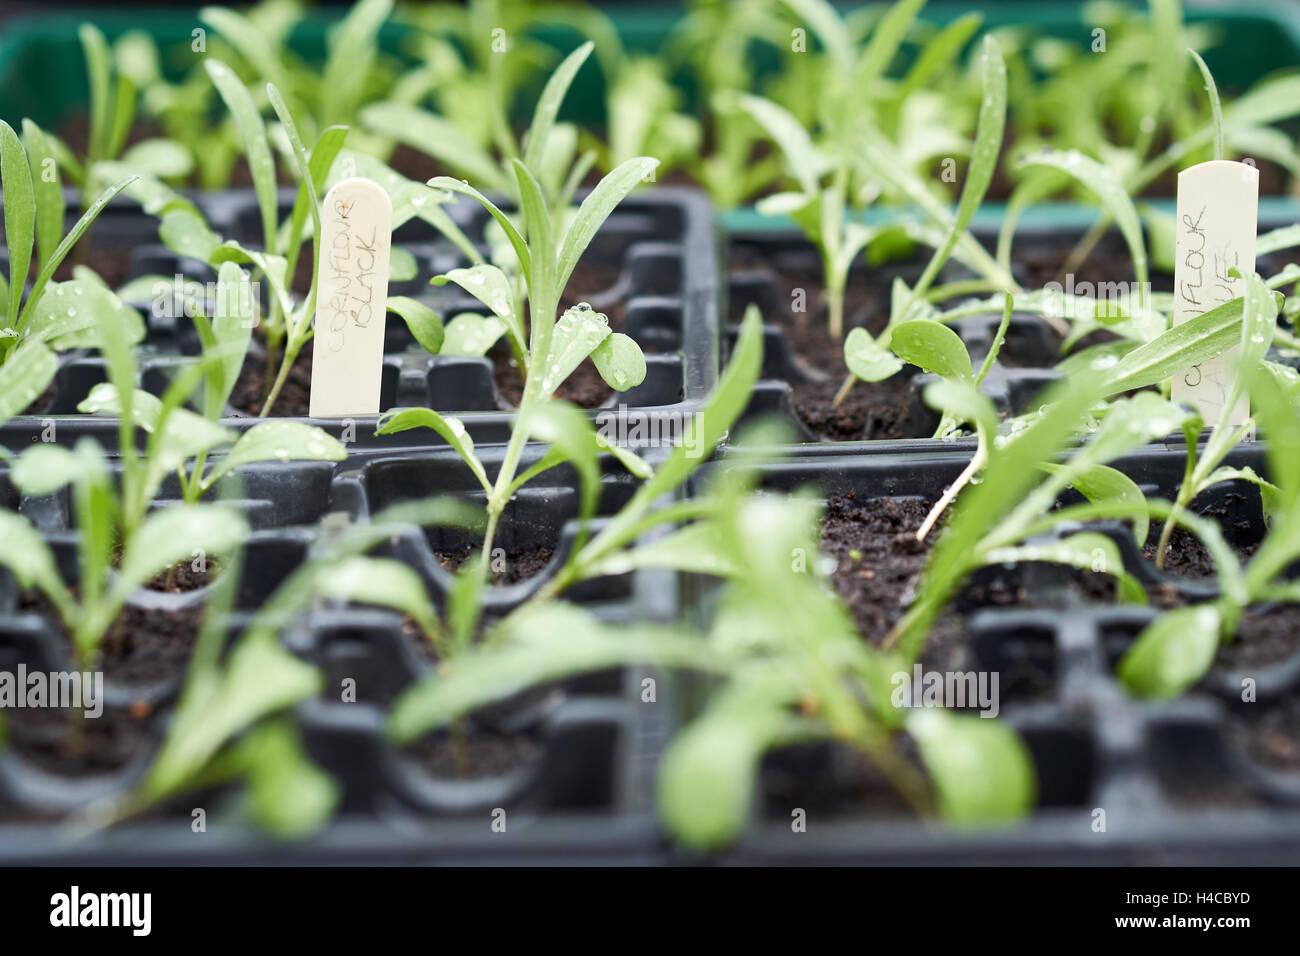 cornflower seedlings stock photos